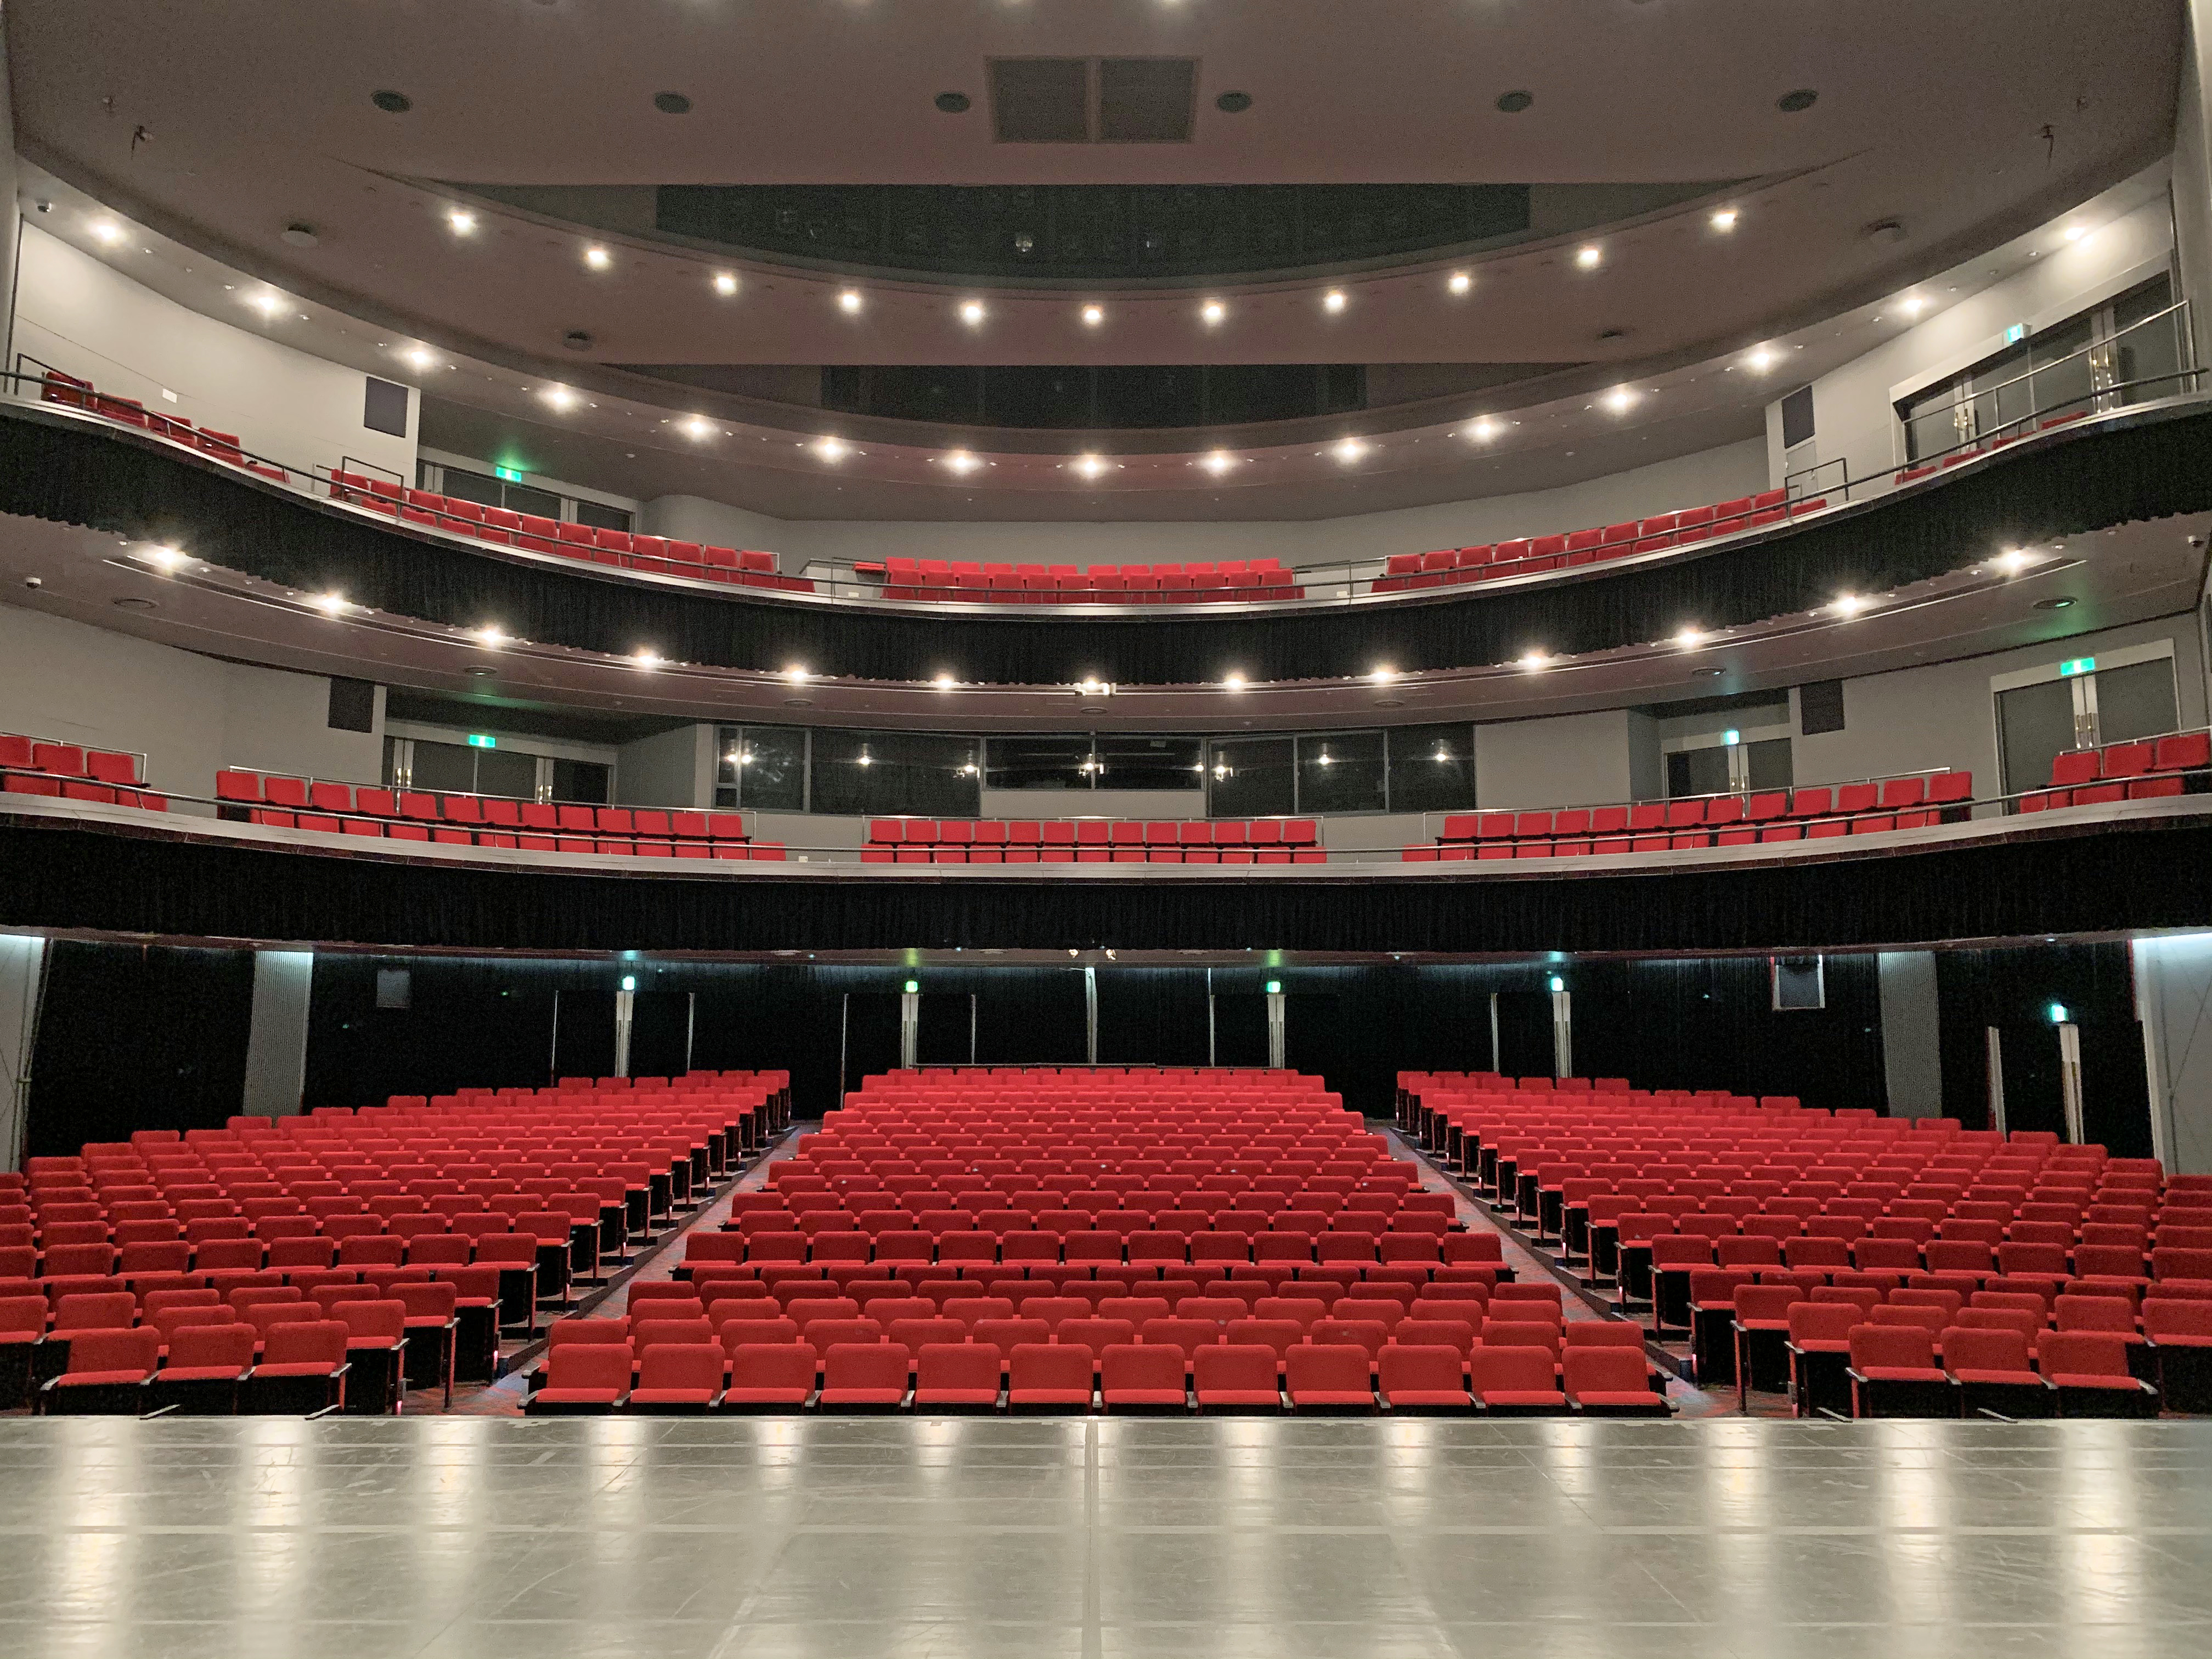 AiiA 2.5 Theater Kobe